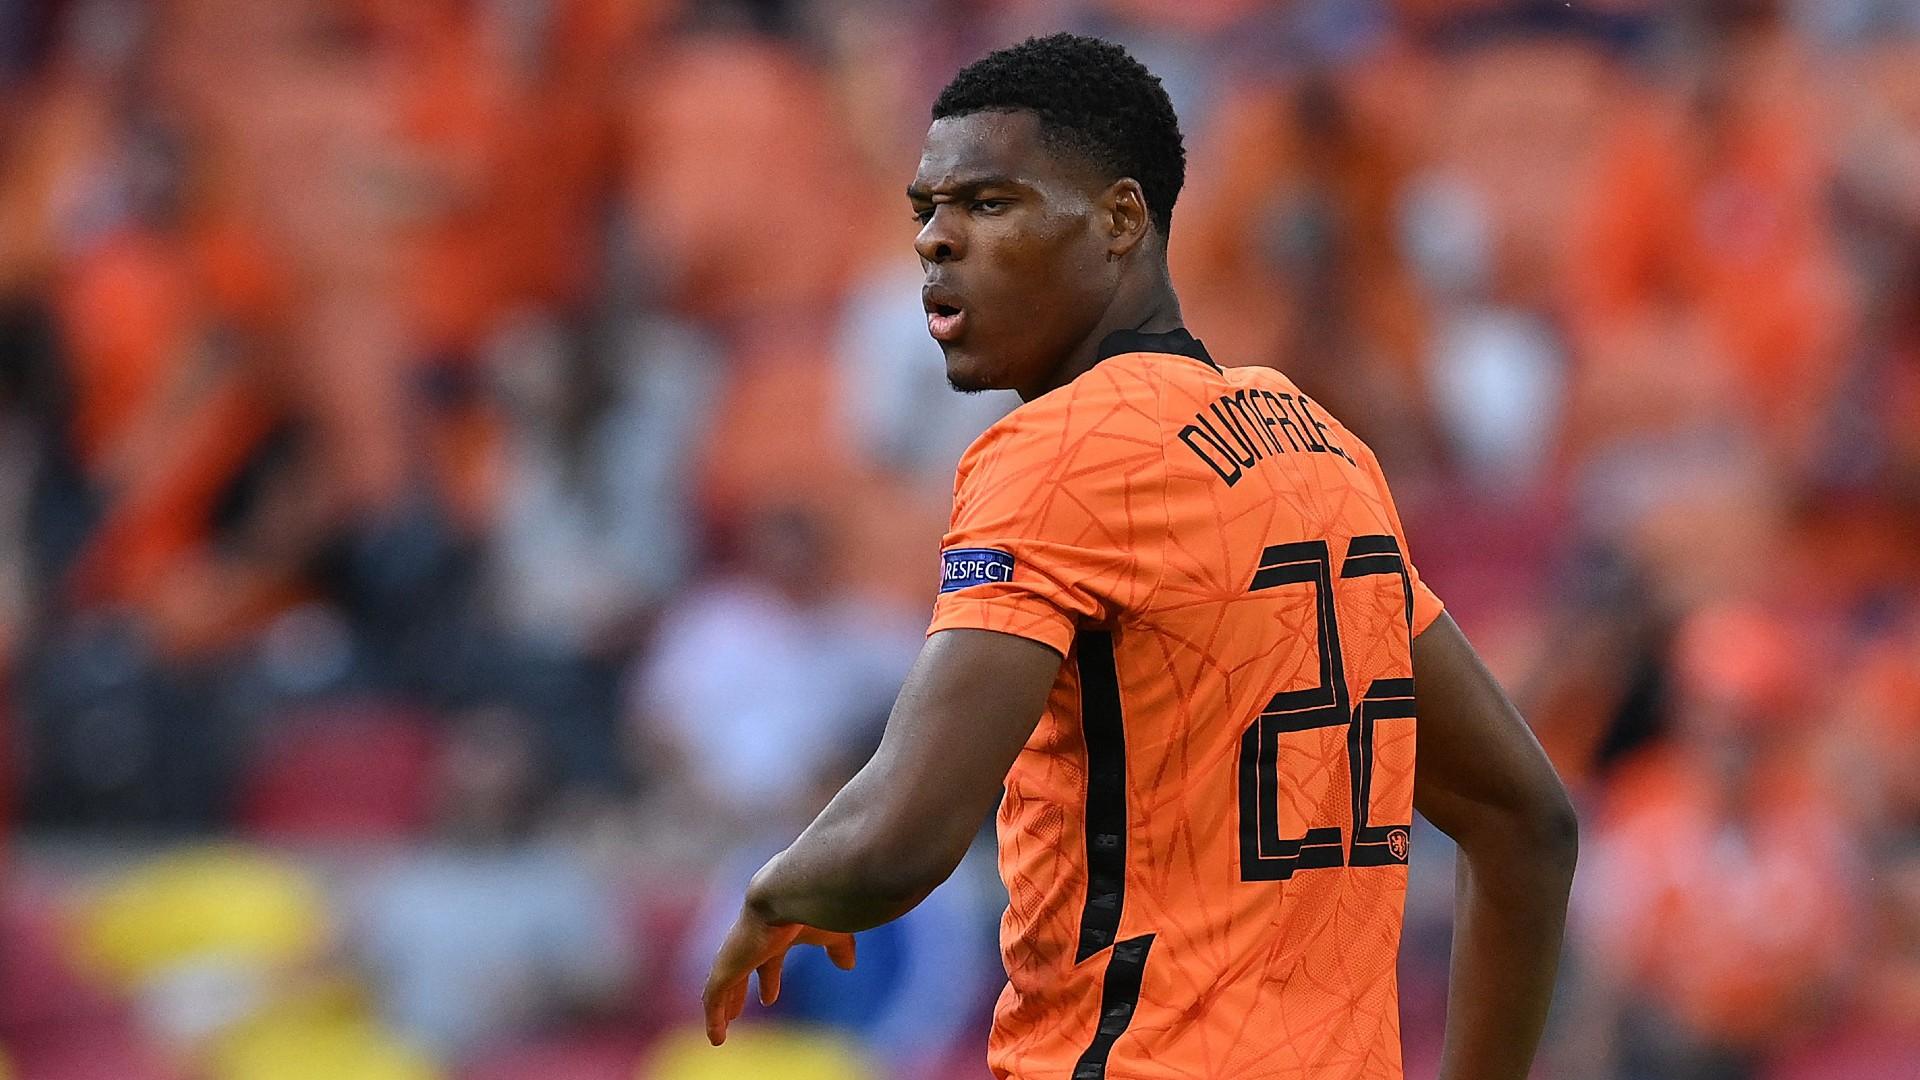 Netherlands star Dumfries responds to transfer talk amid impressive Euro 2020